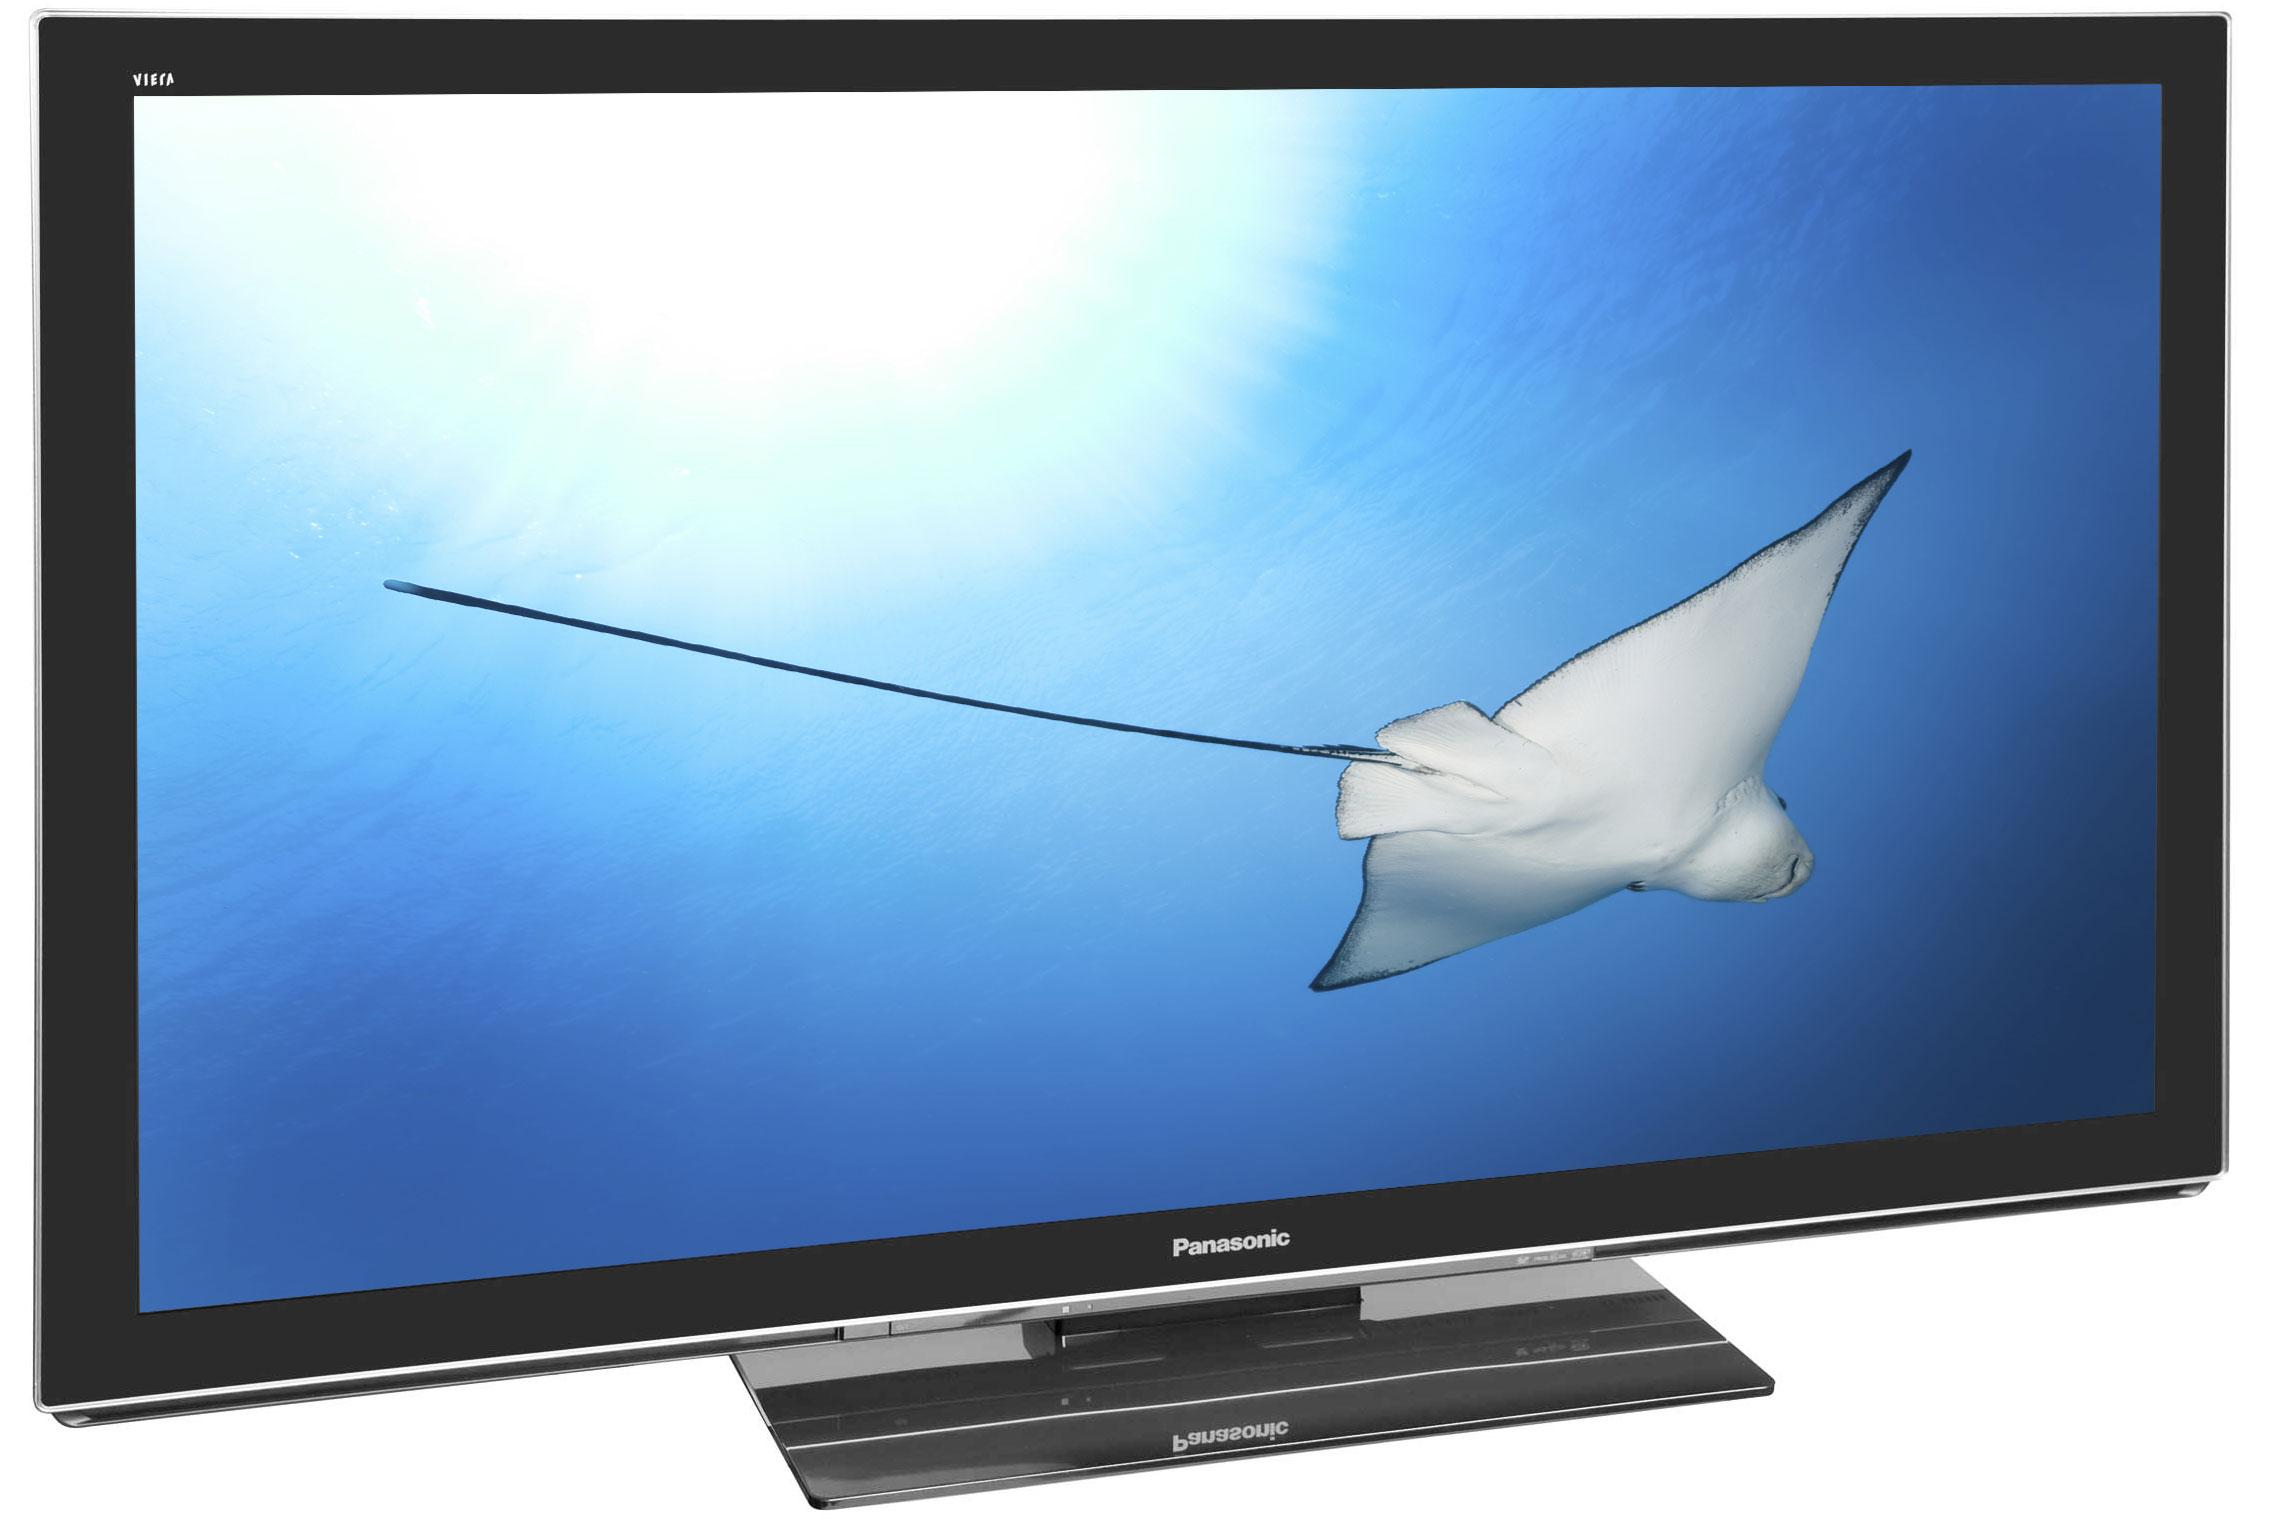 angebot panasonic 3d plasma tv 55 zoll neo txp55vt30. Black Bedroom Furniture Sets. Home Design Ideas